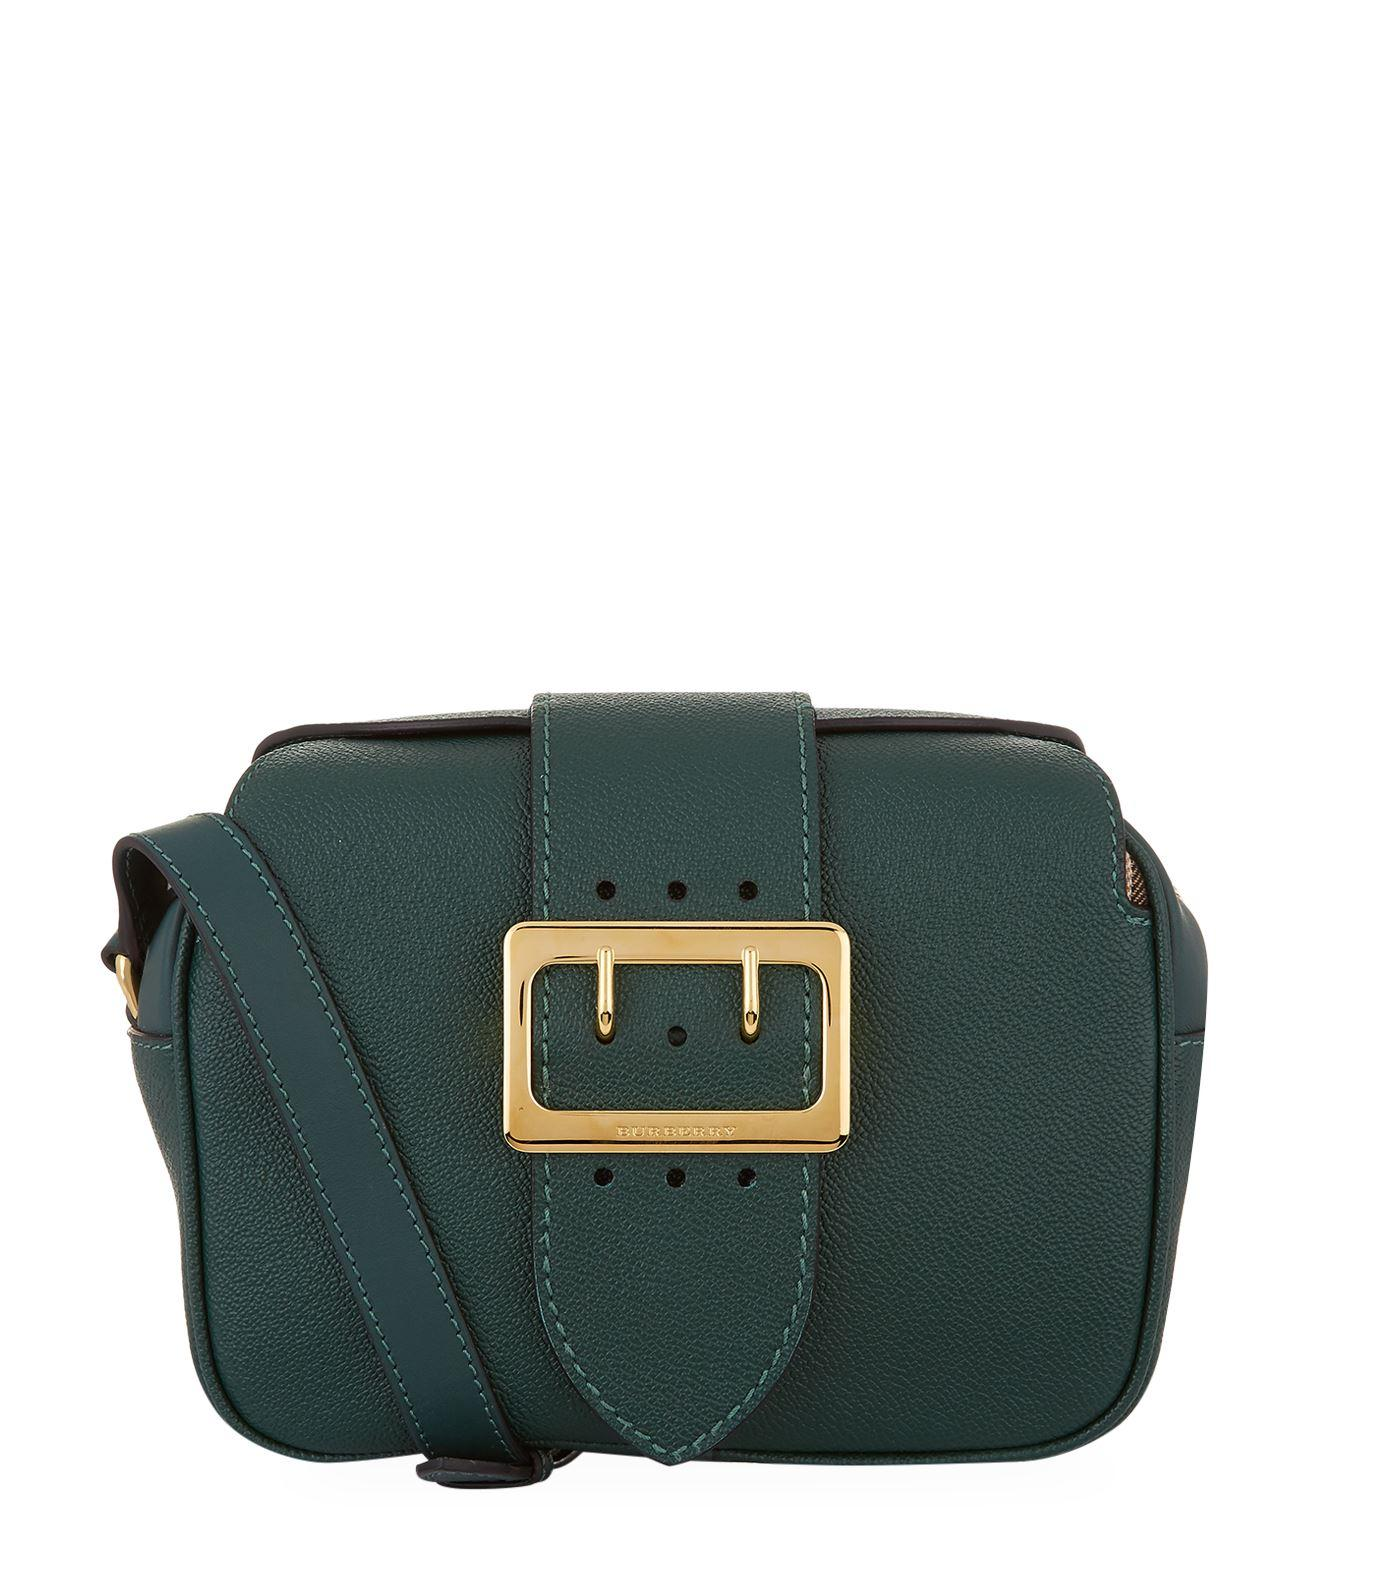 7f34ff674999 Burberry Small Buckle Leather Crossbody Bag - Green